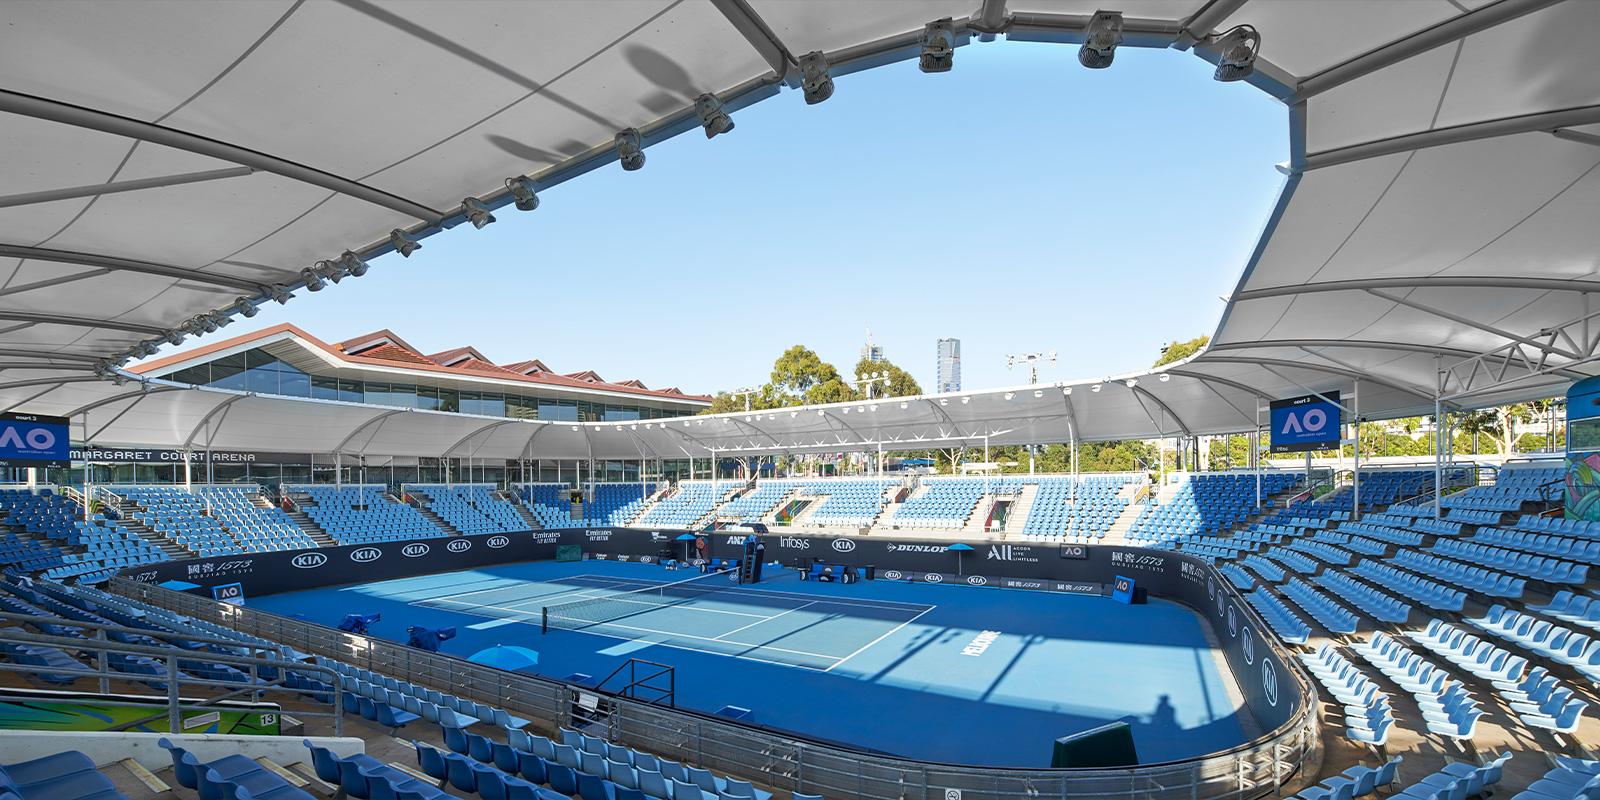 Australian Open Showcourt 3